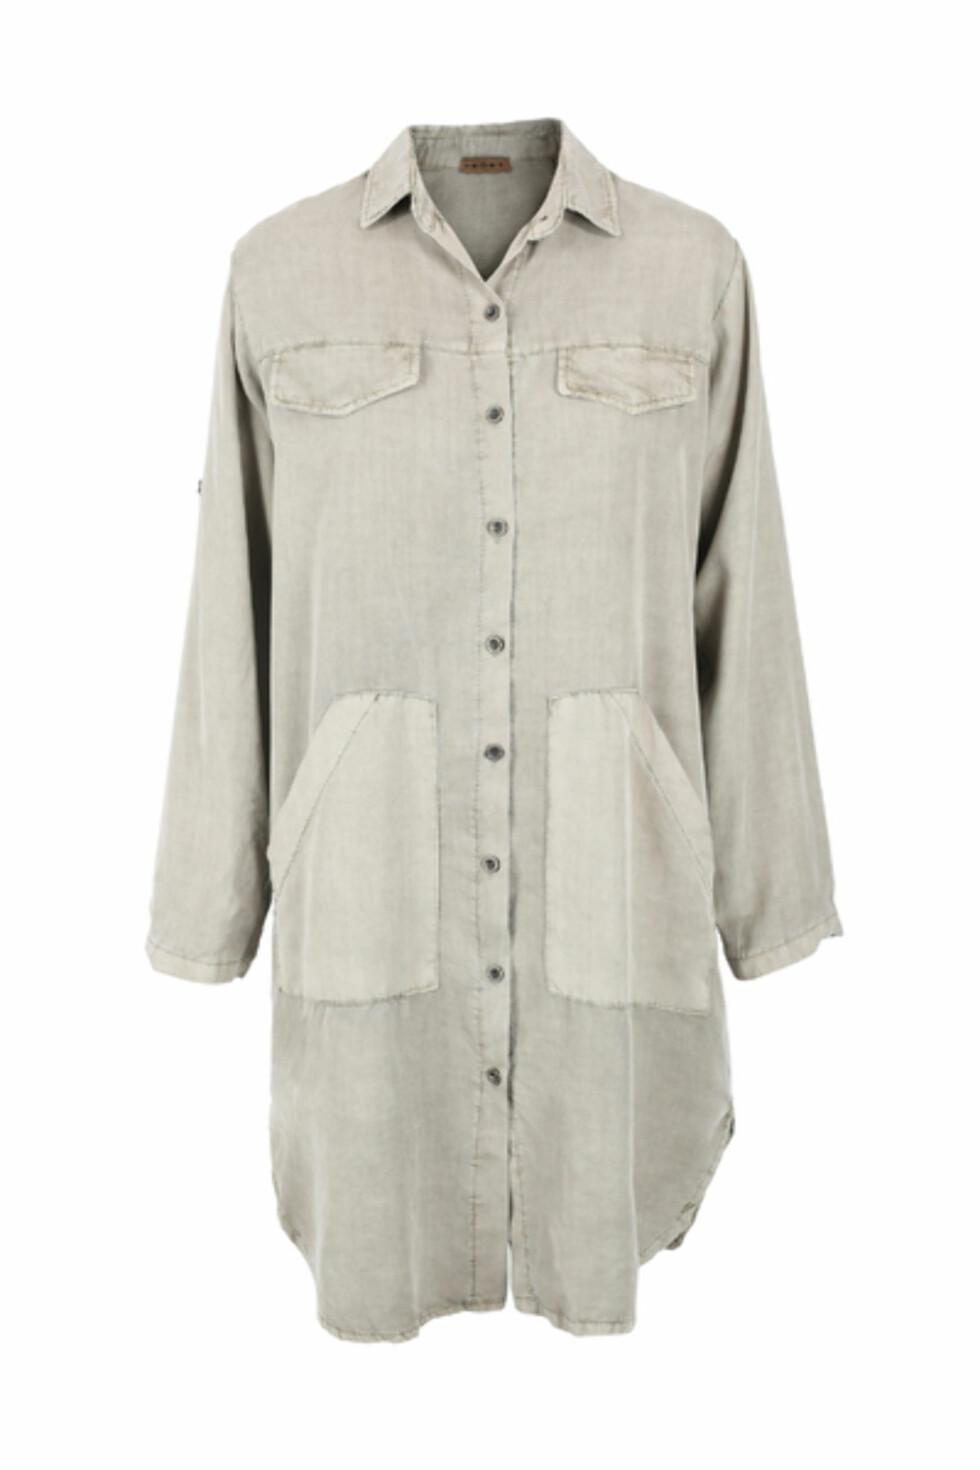 Skjorte fra Cocco Bello Paris via Miinto.no   kr 799   https://www.miinto.no/p-719296-kaki-beige-cocco-bello-paris-kjole